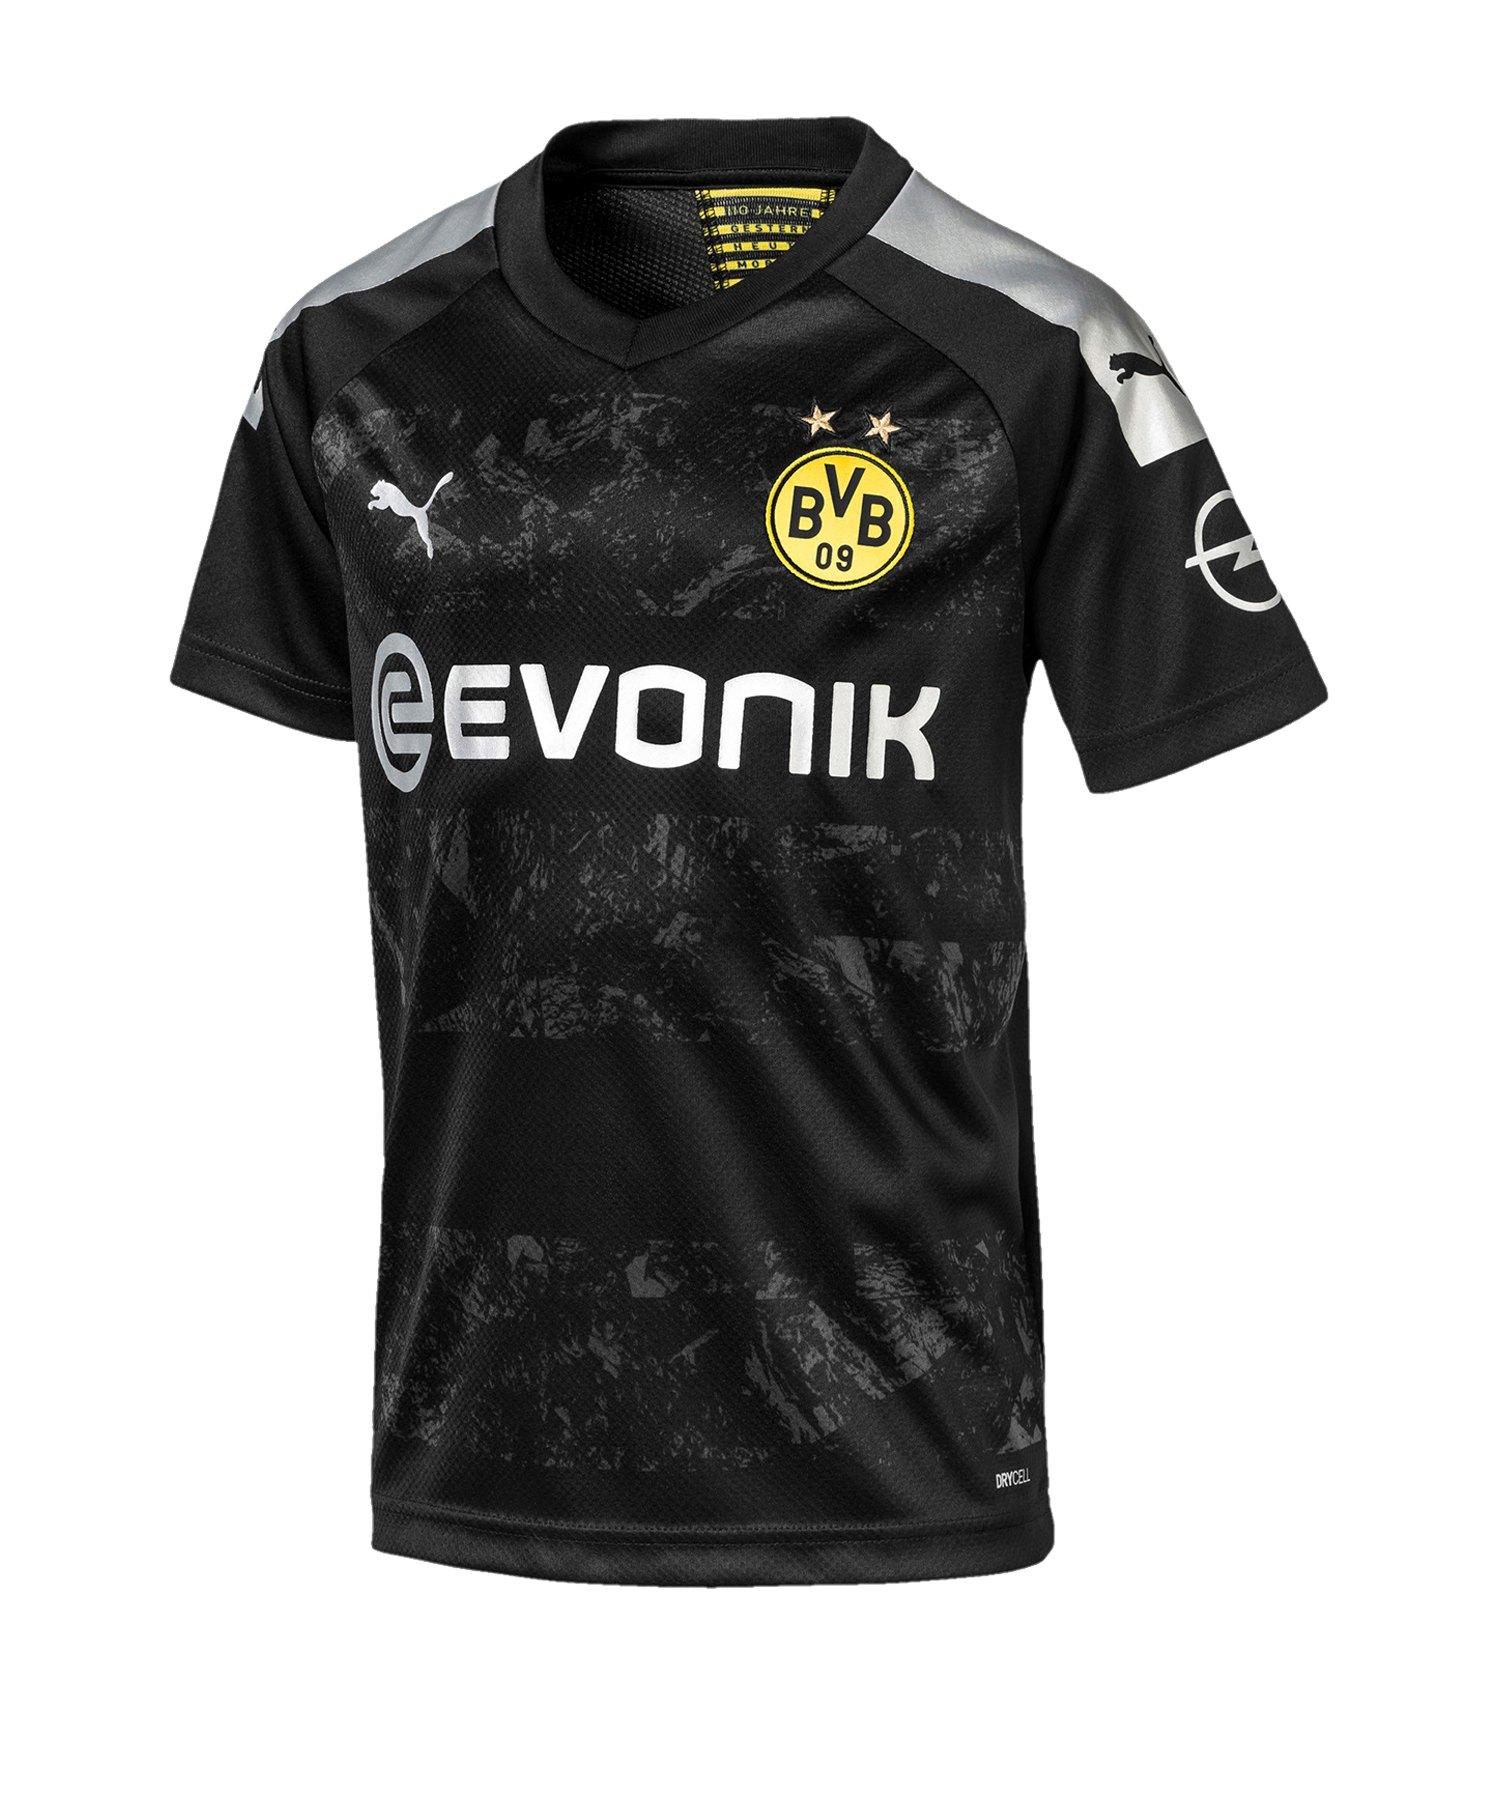 PUMA BVB Dortmund Trikot Away 2019/2020 Kids F12 - Schwarz